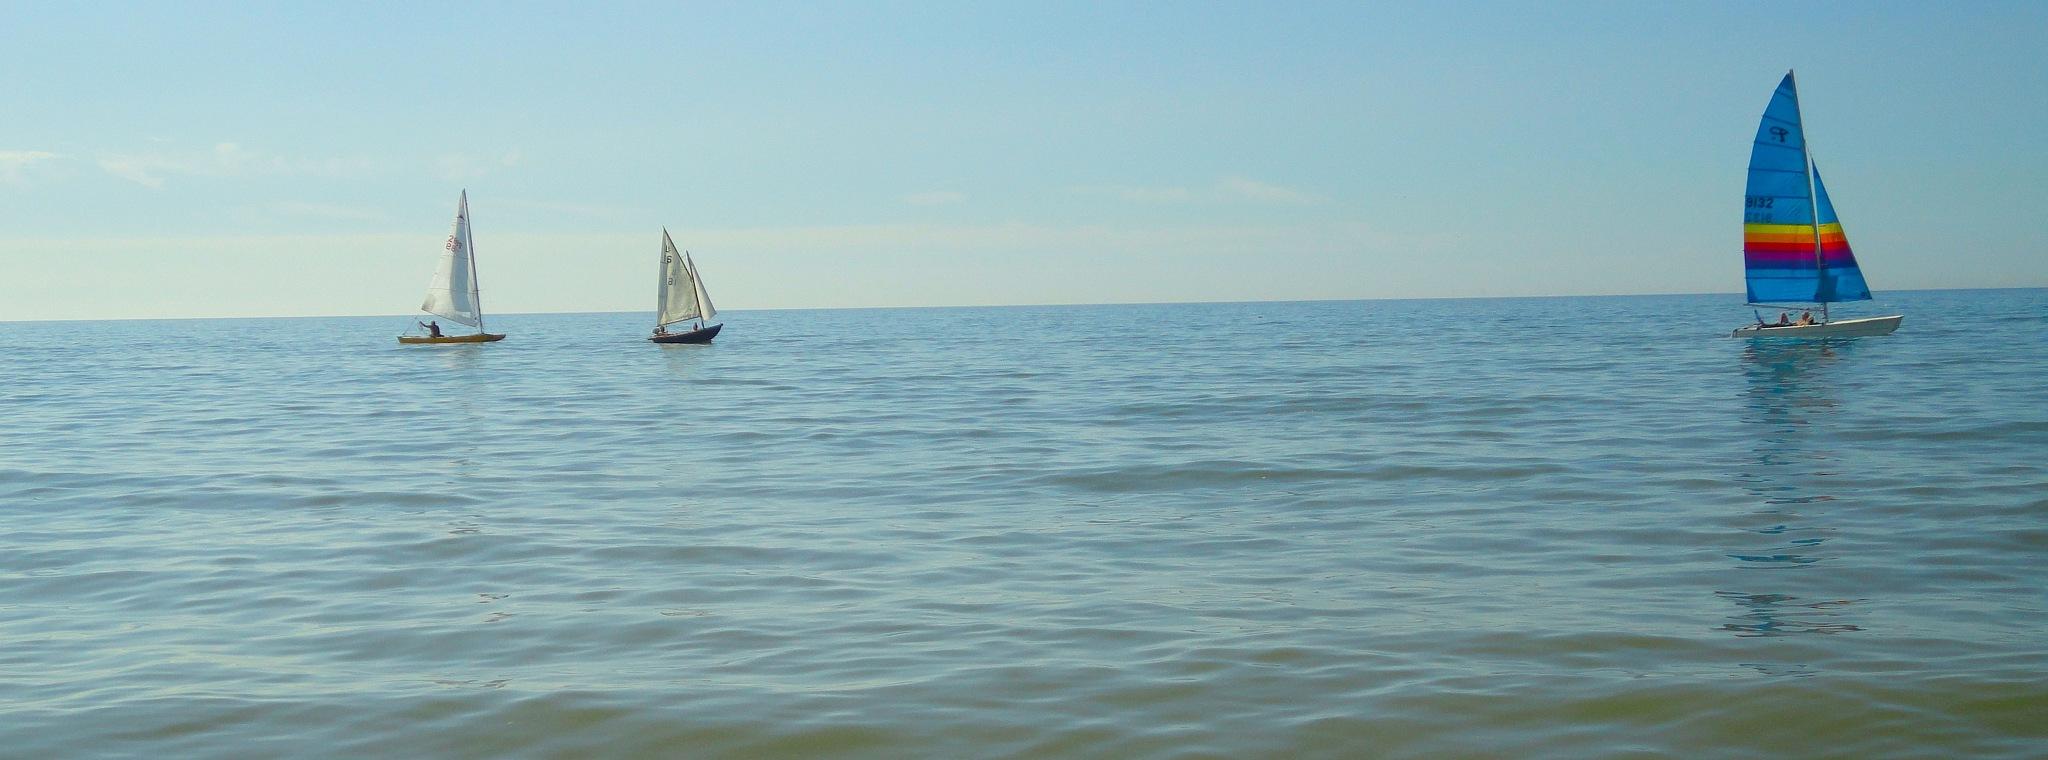 SEA... by Massoud Memar